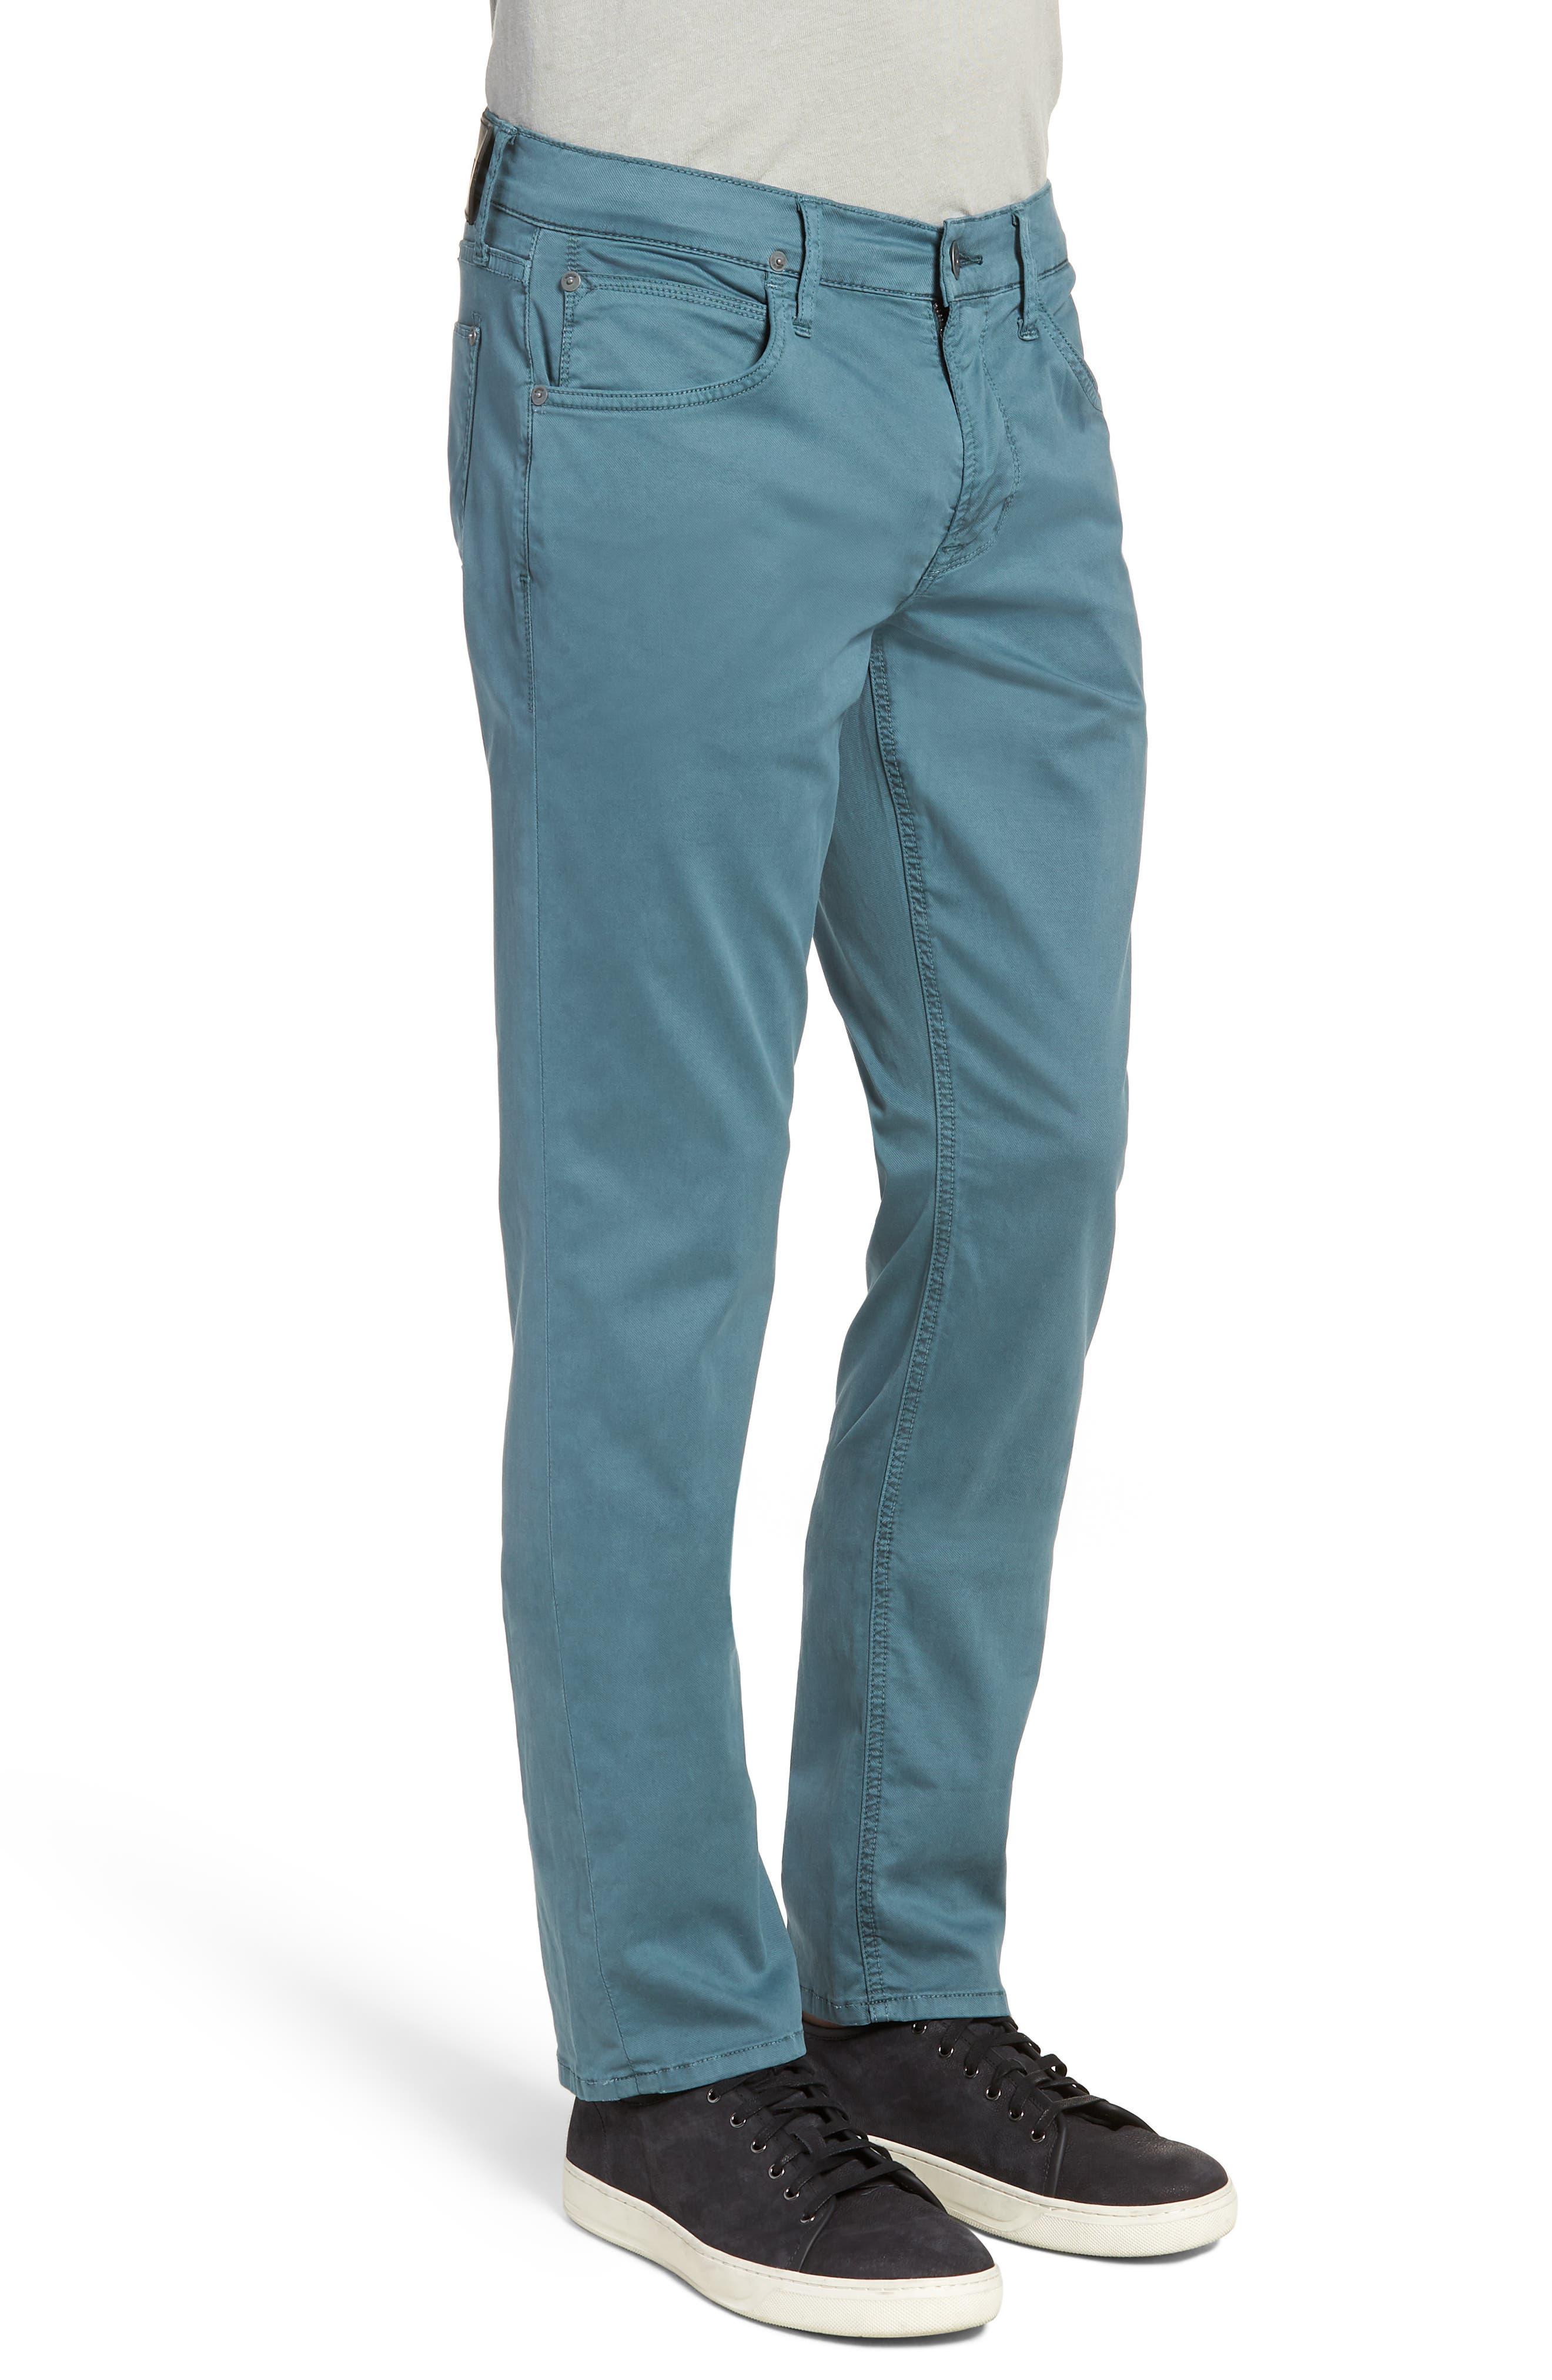 Blake Slim Fit Jeans,                             Alternate thumbnail 3, color,                             497